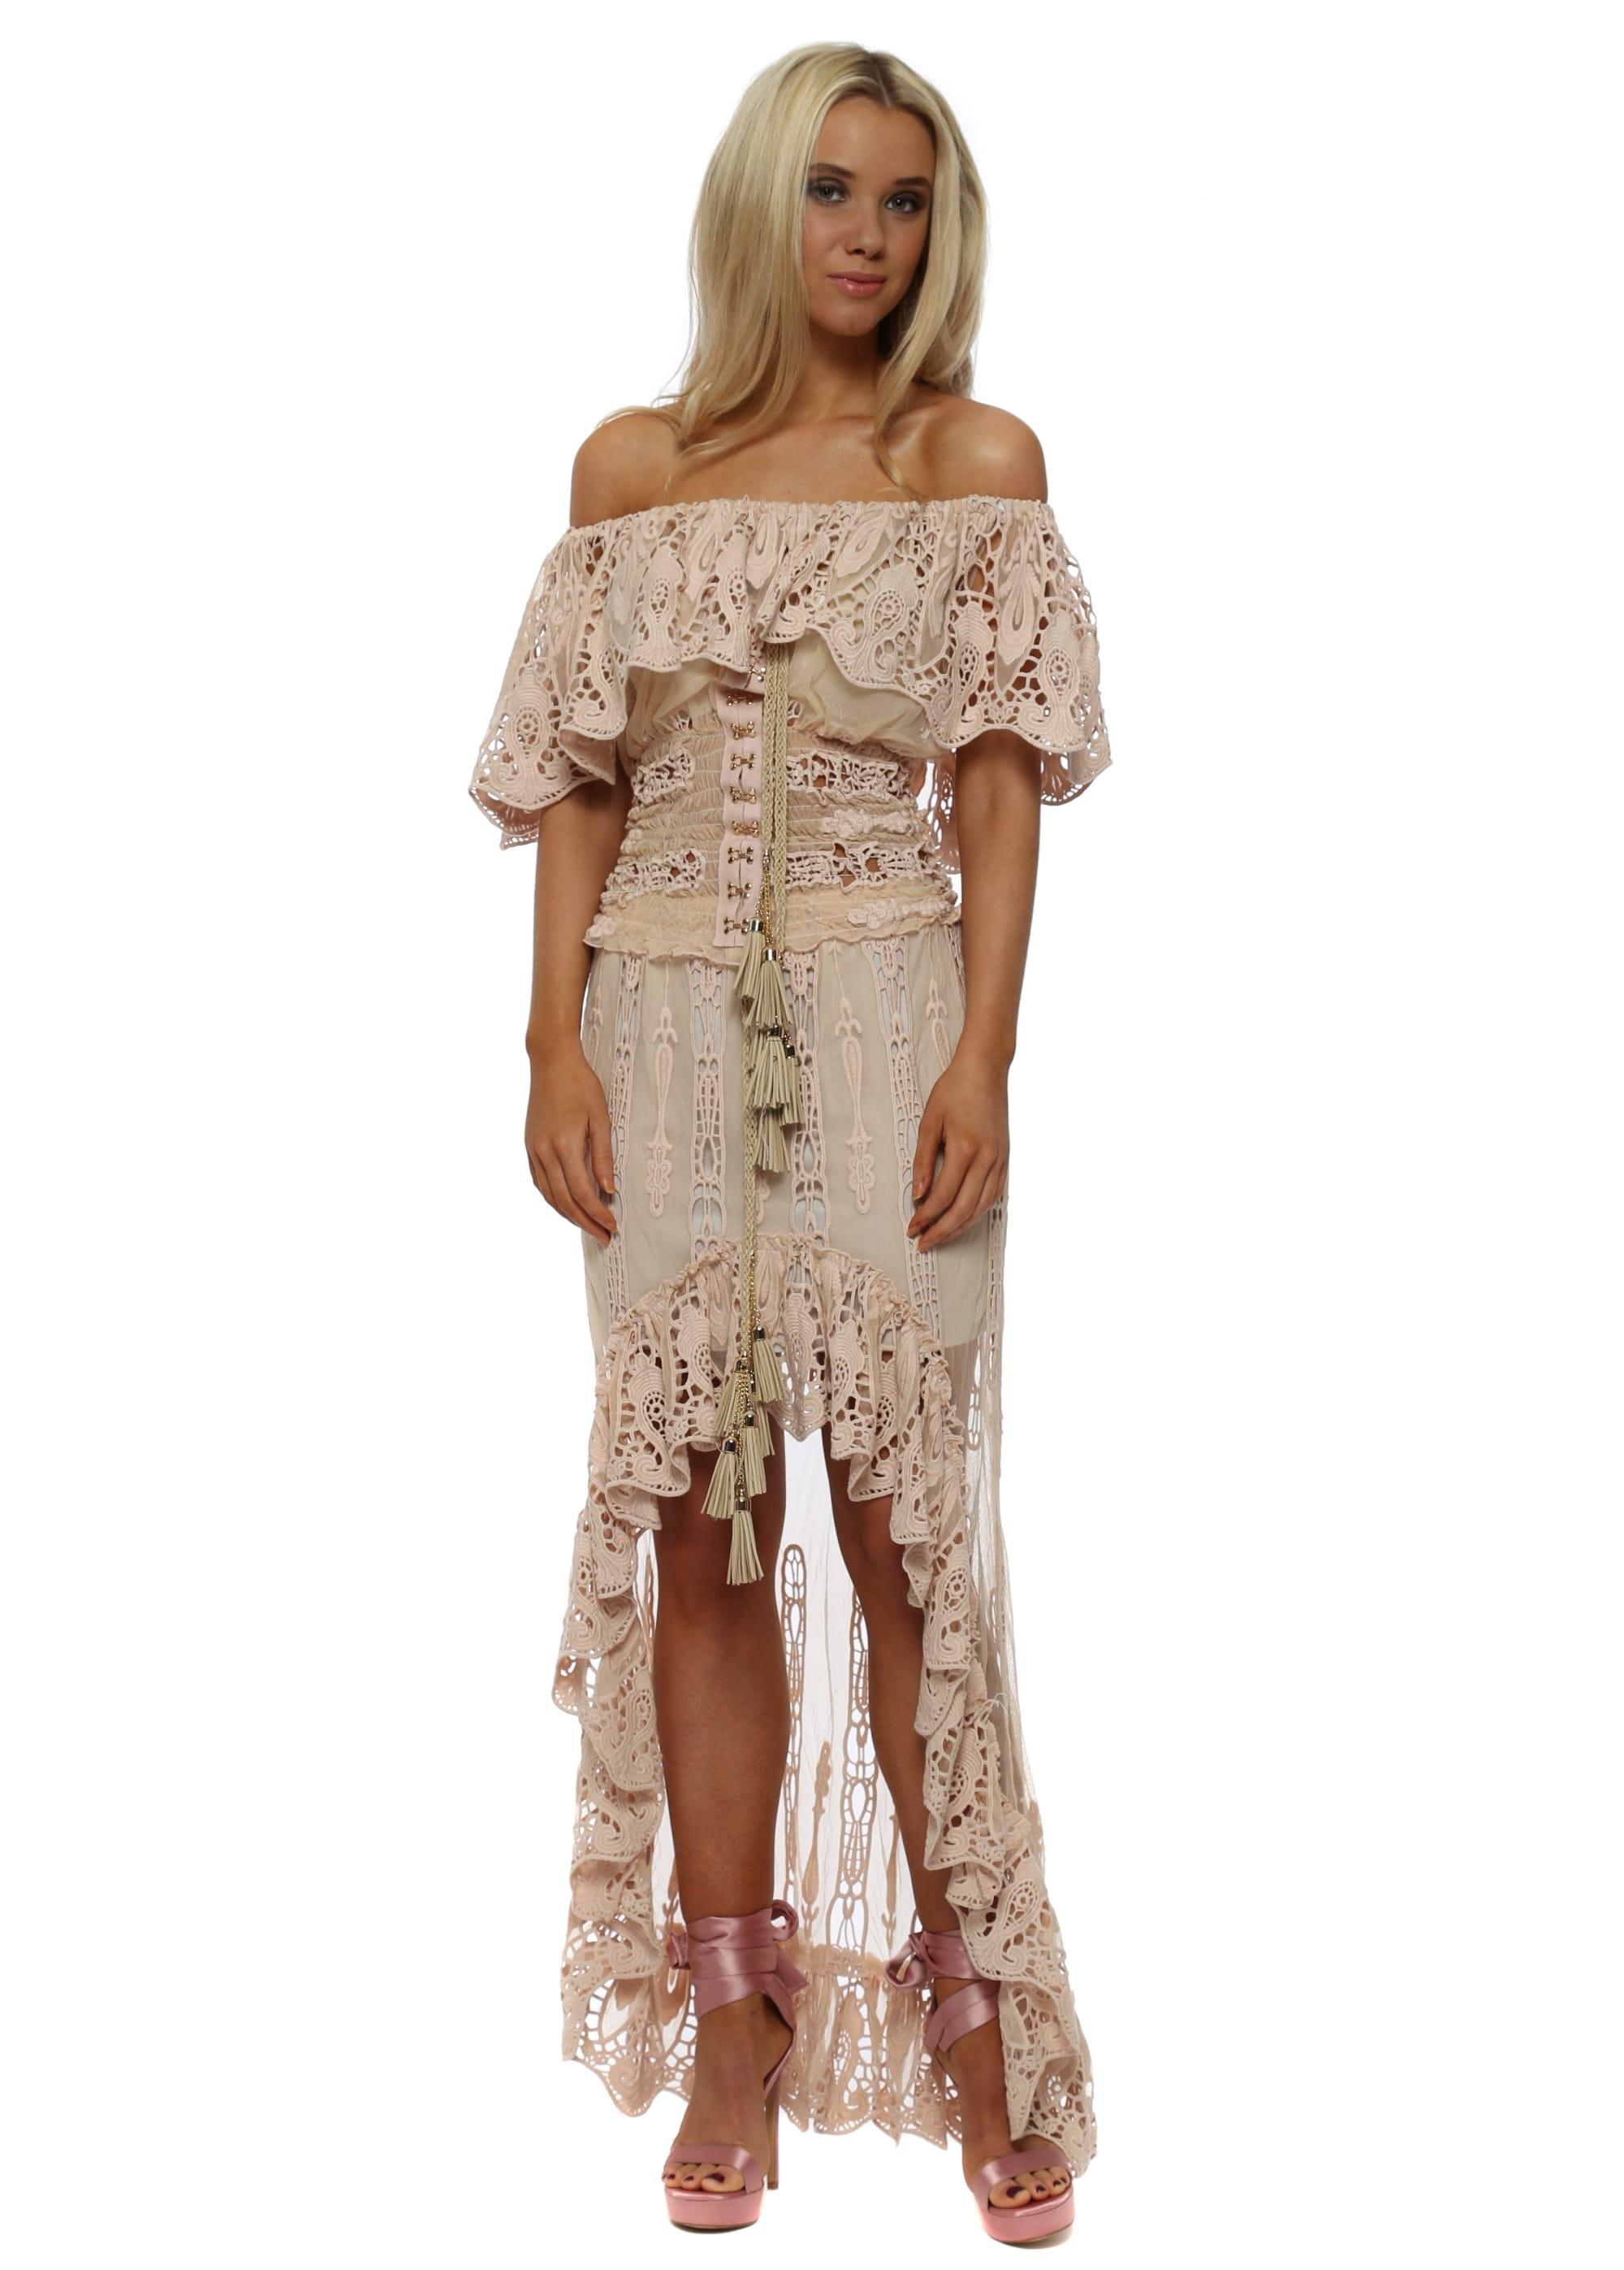 Laurie Joe Nude Pink Maxi Skirt Bardot Lace Top